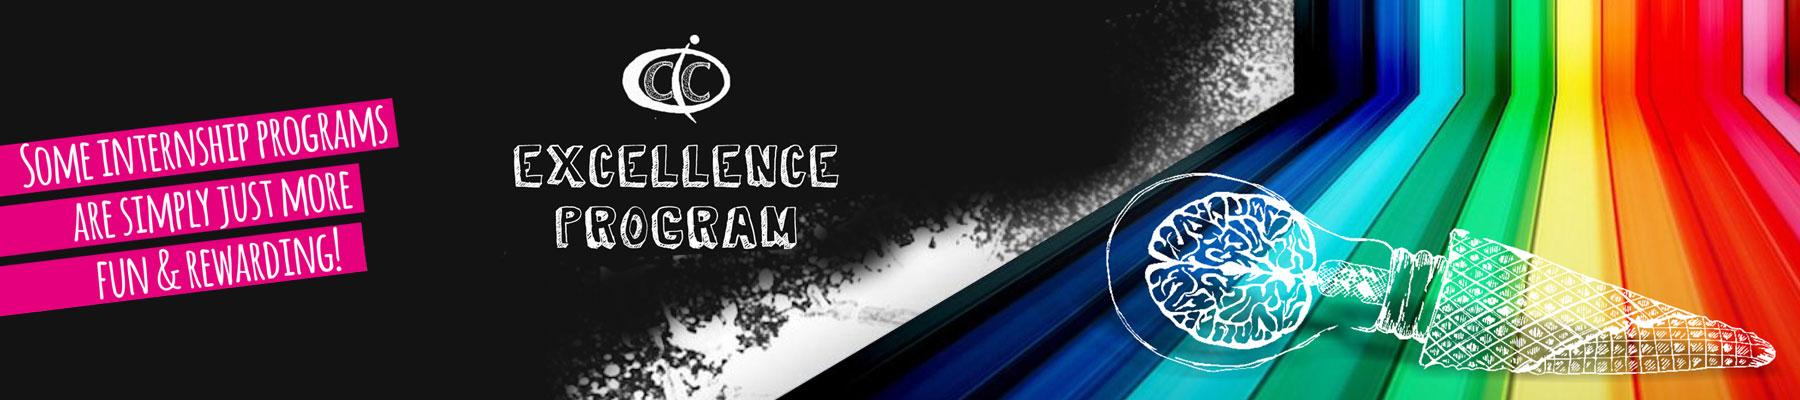 CIC Excellence Program